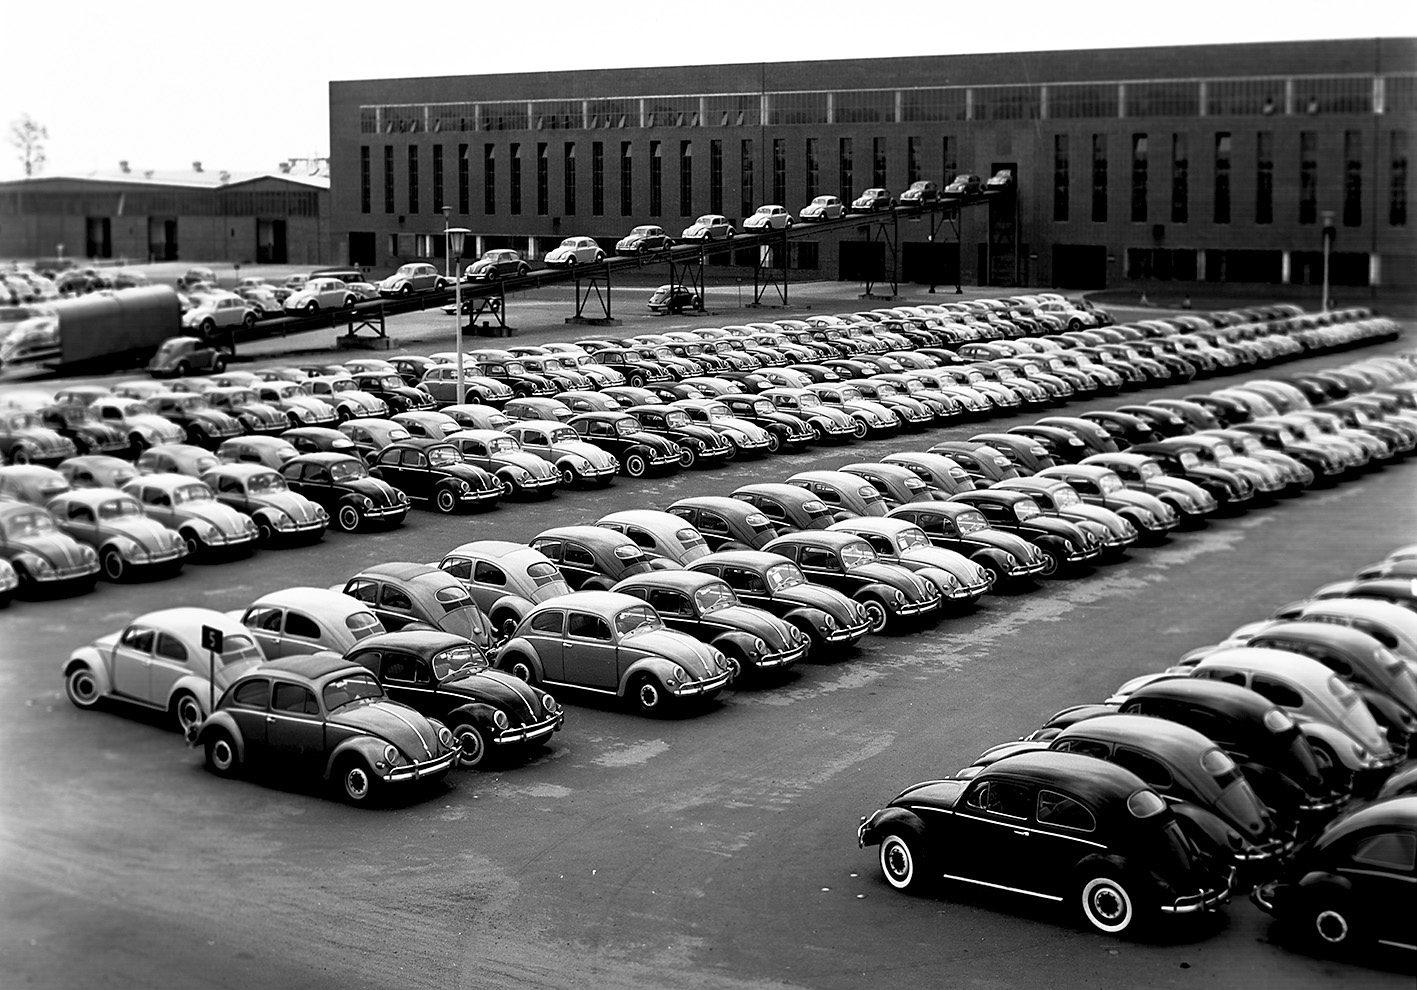 Fototapete, Architects Paper, »VW Käfer Fototapete«, Fabrik